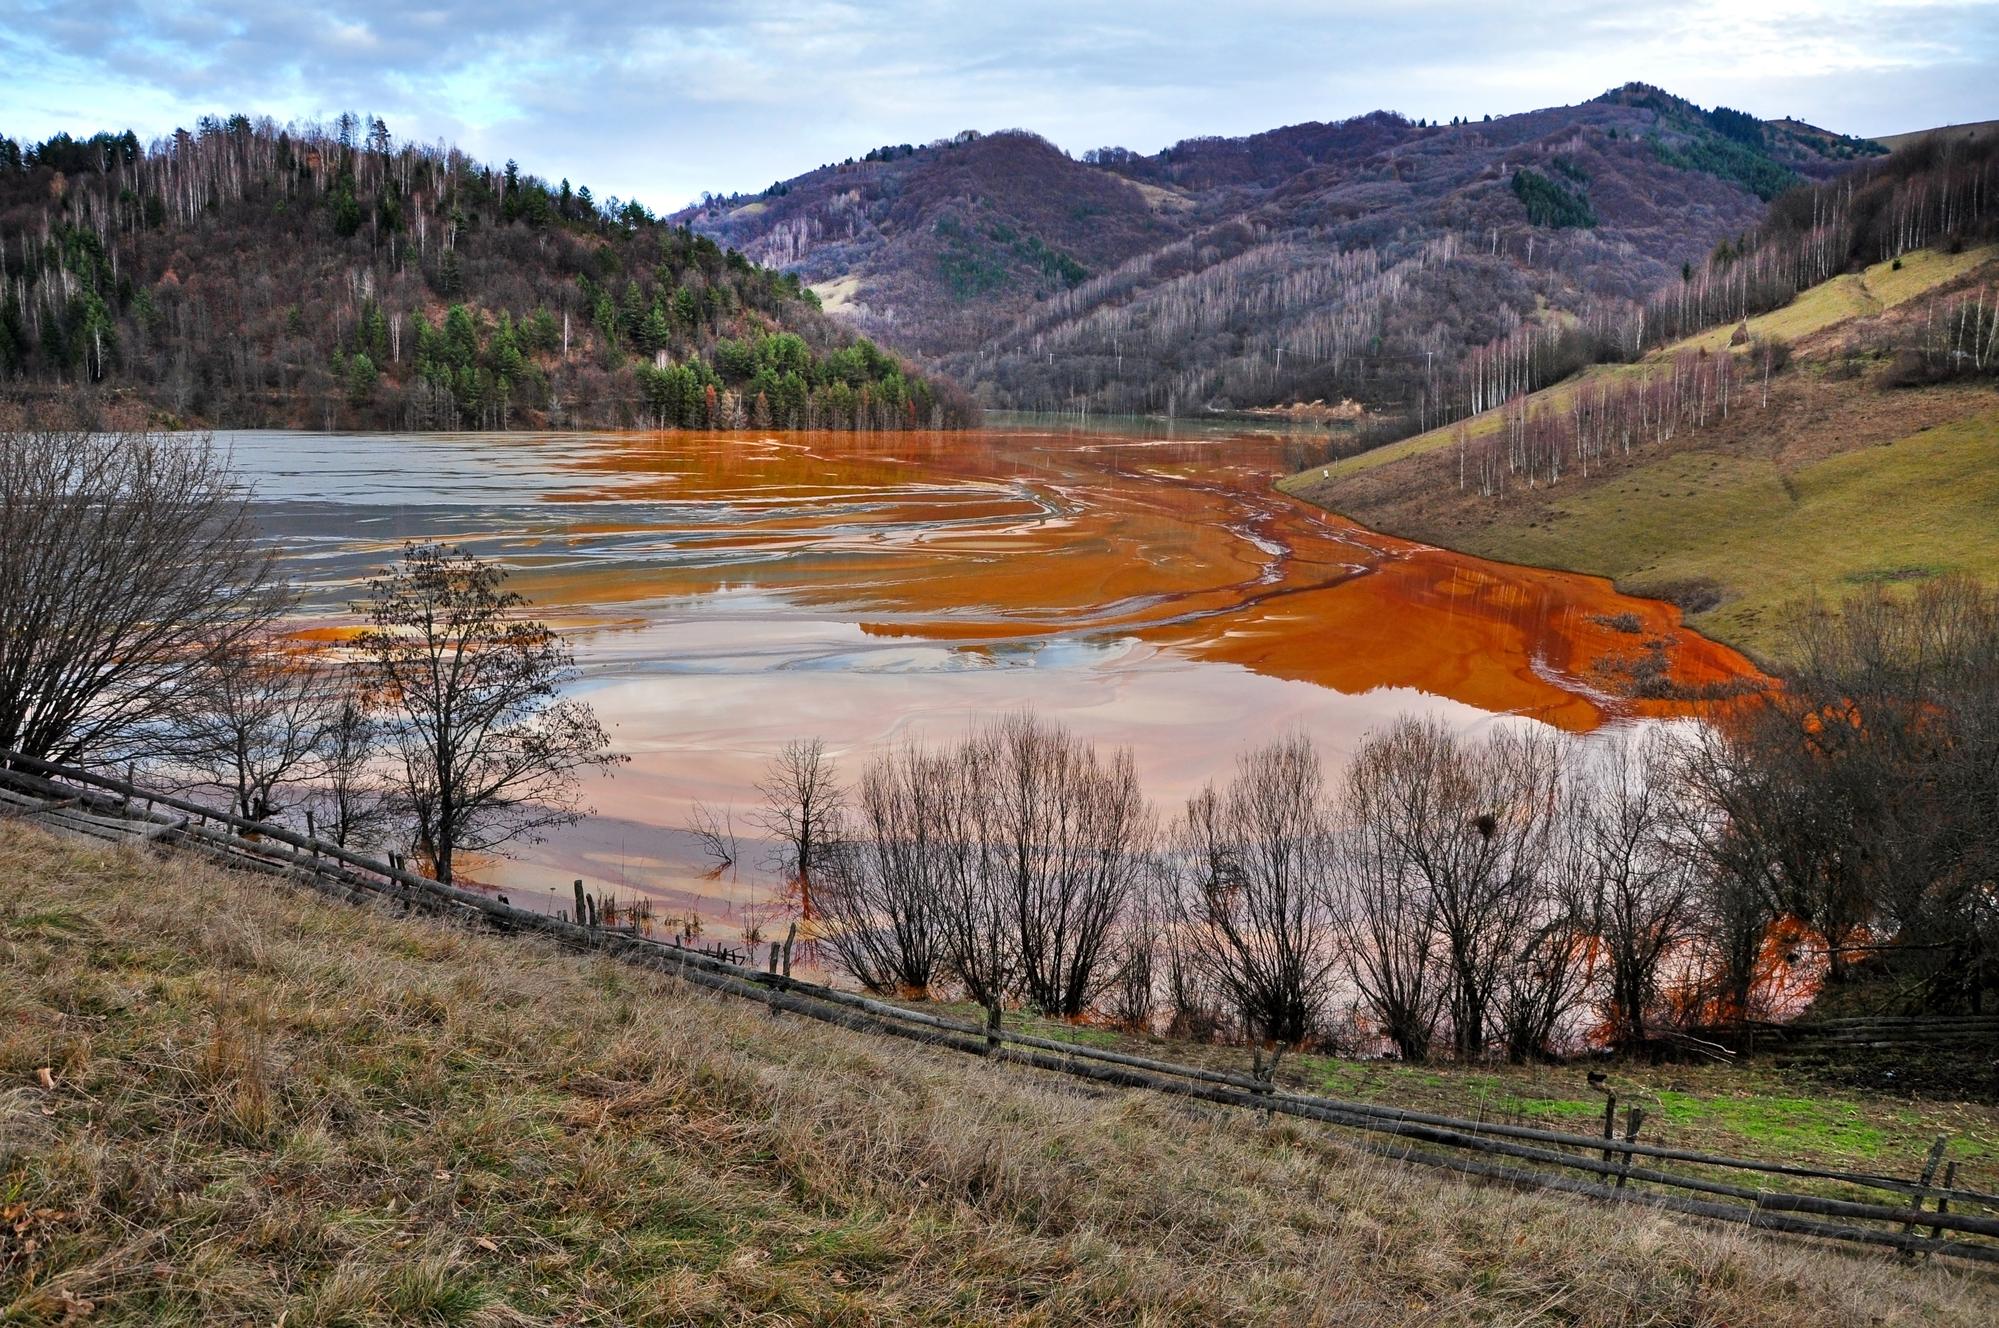 Landscape showing impact of mine waste.